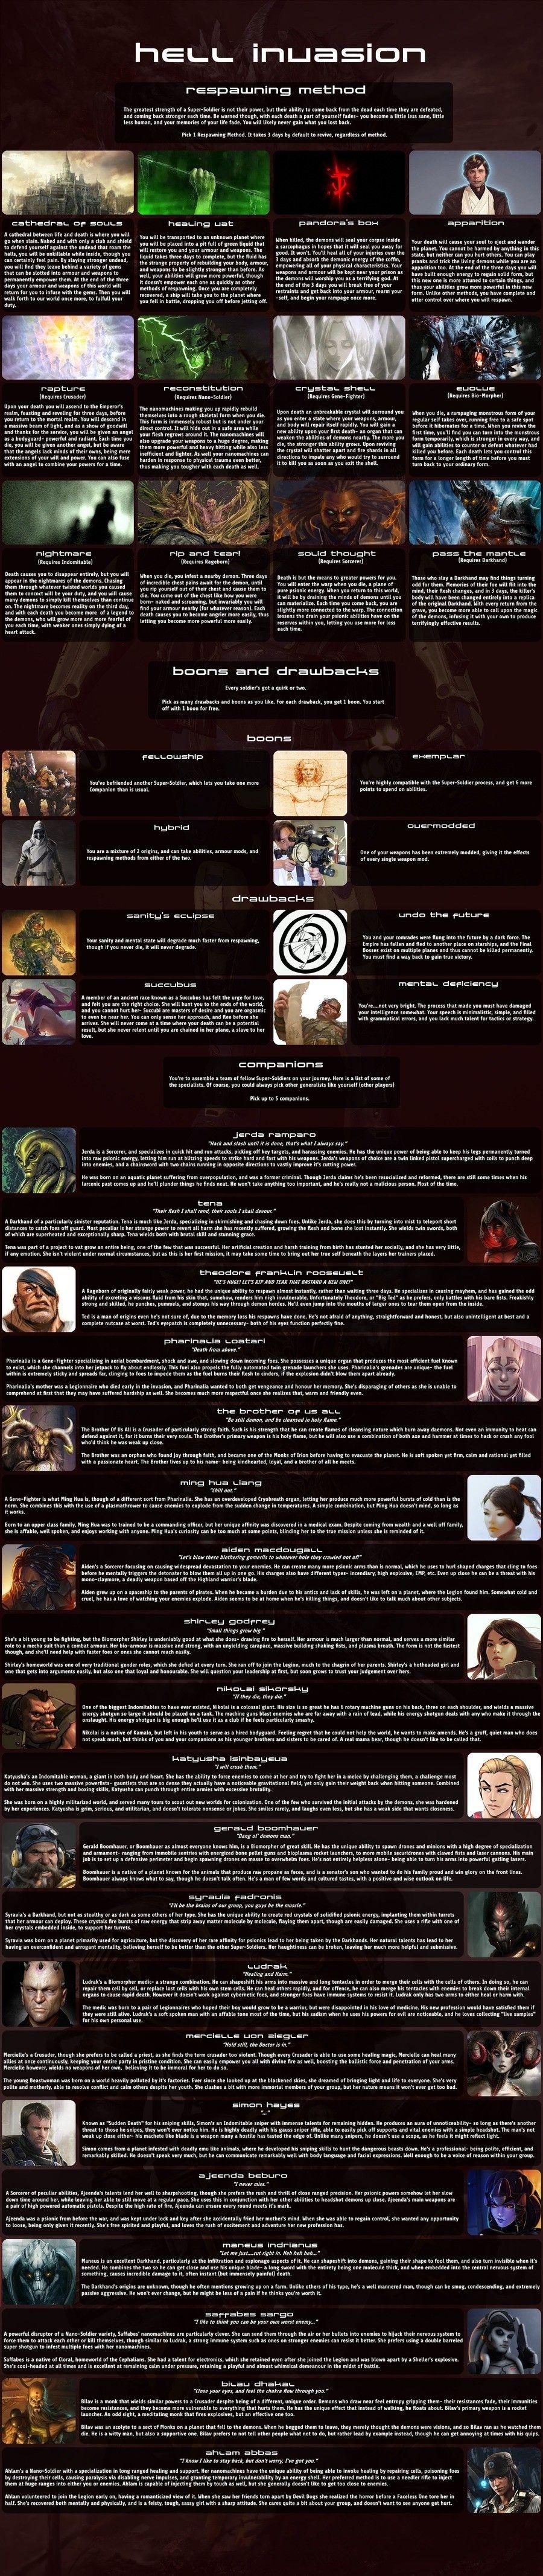 Hell Invasion V 3 0 | CYOA | Cyoa, Fantasy characters